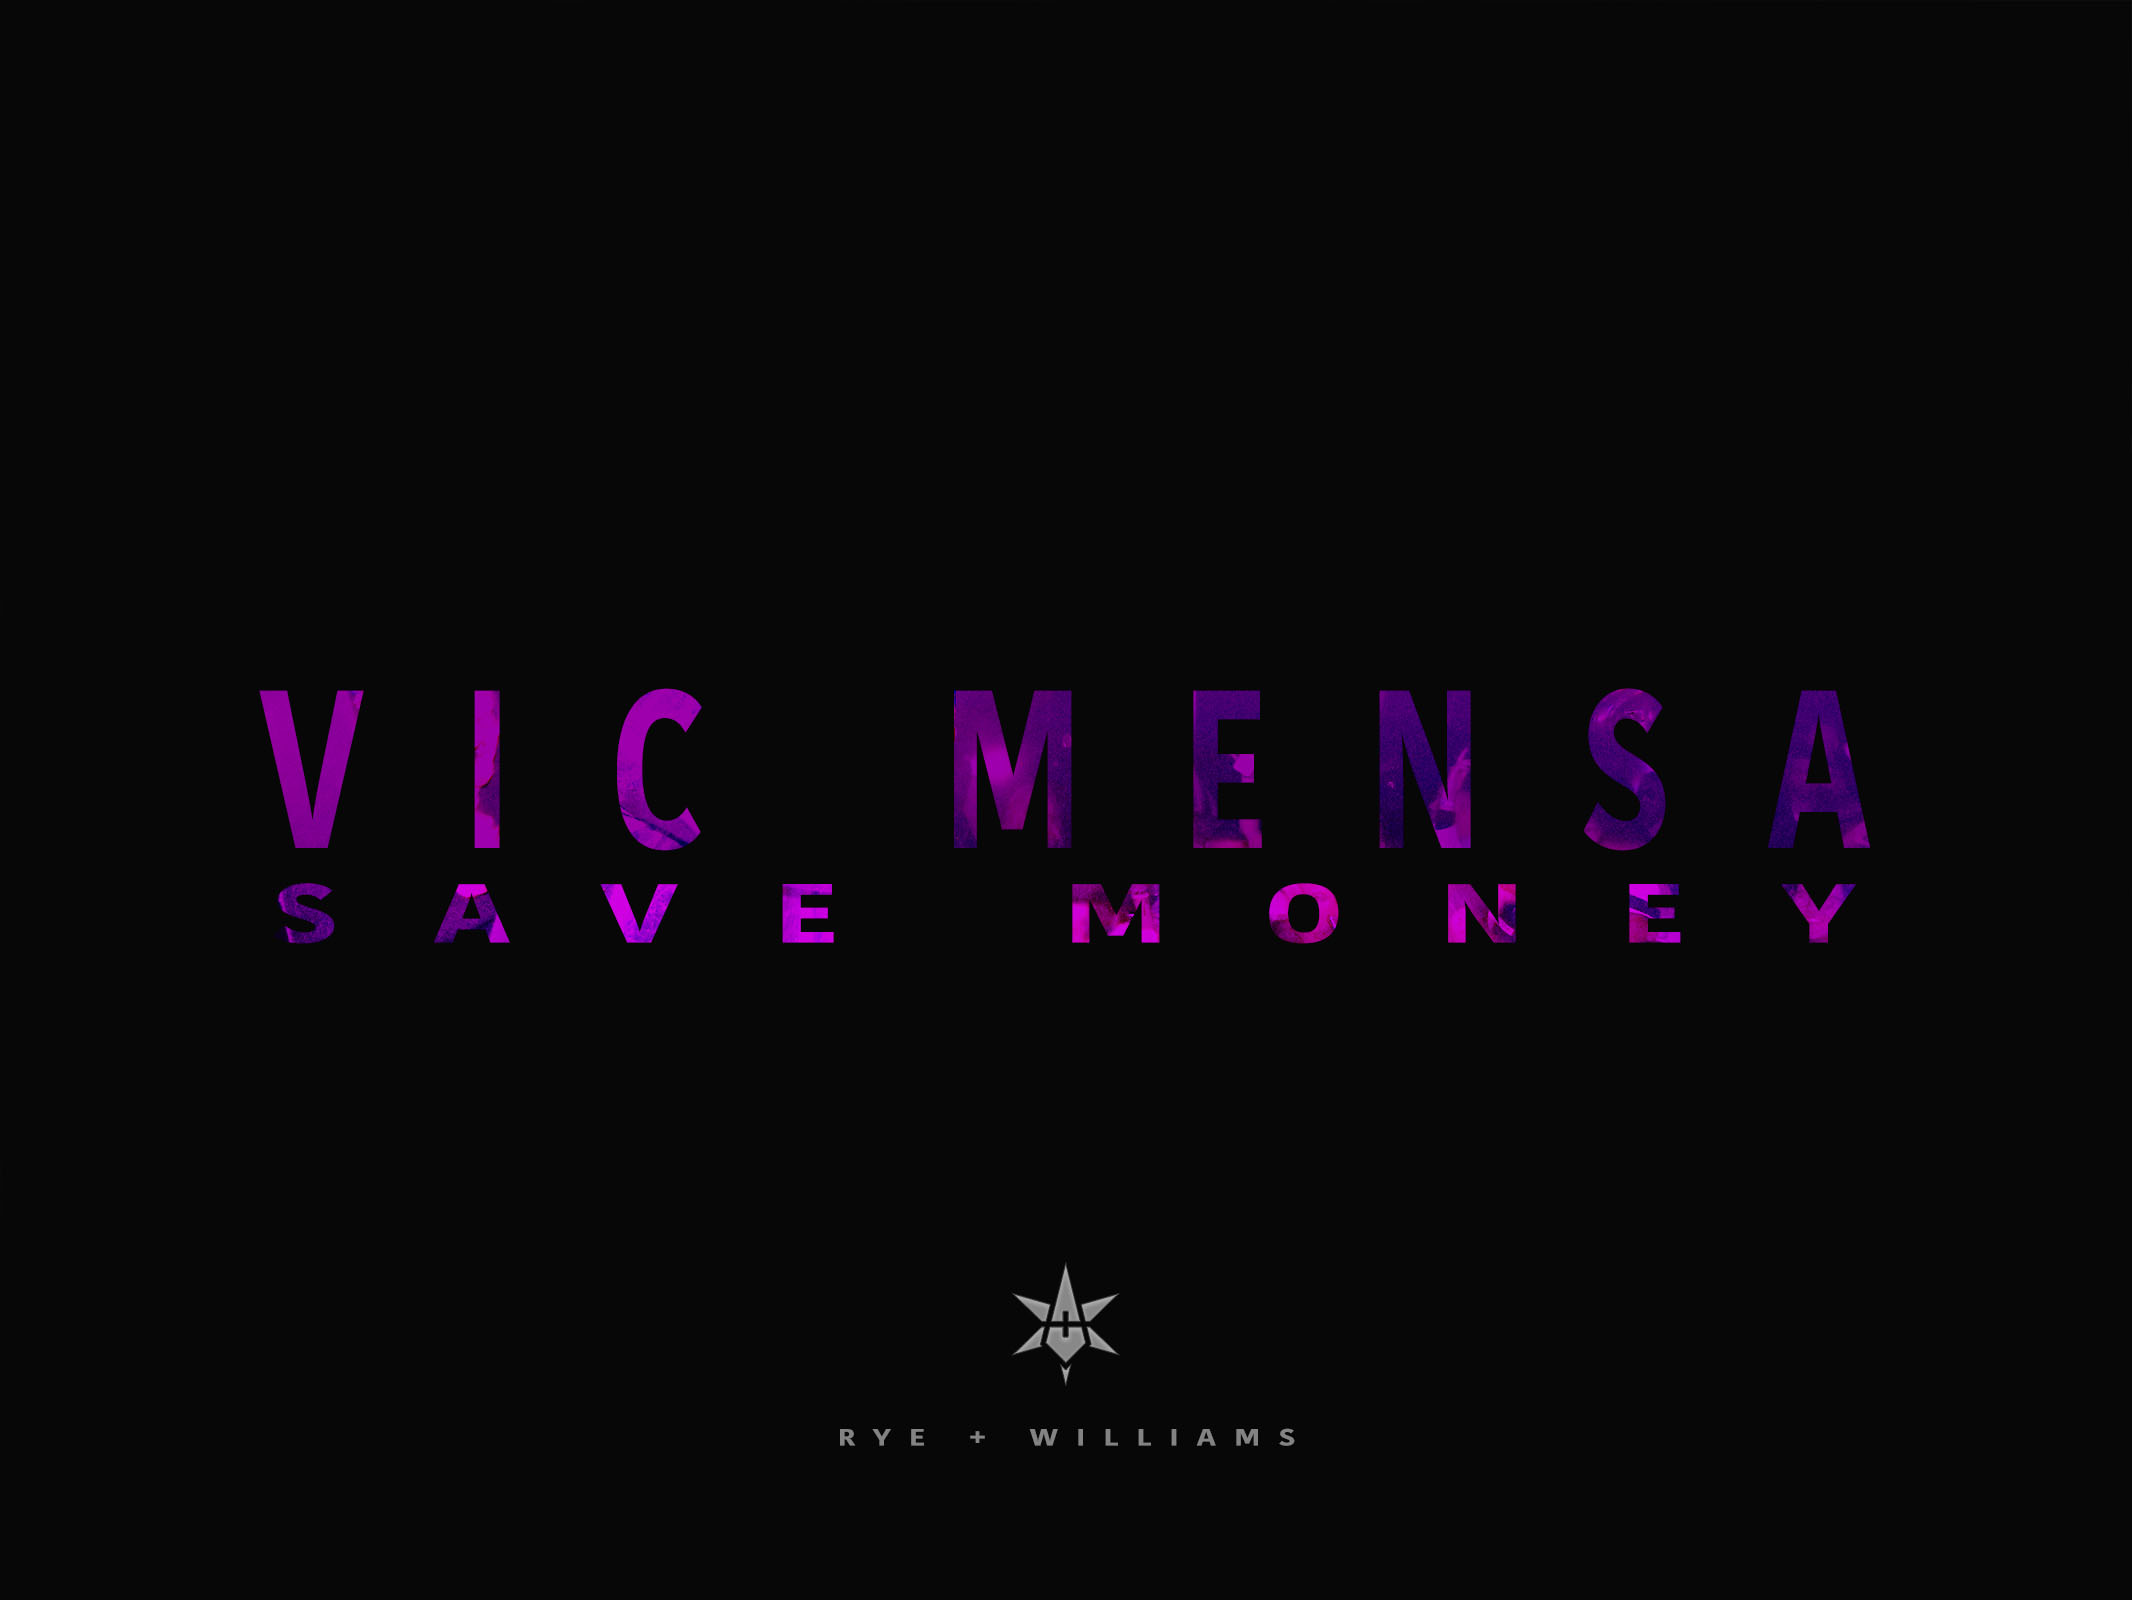 IMG_9828 SAVE MONEY DROP 1600.jpg